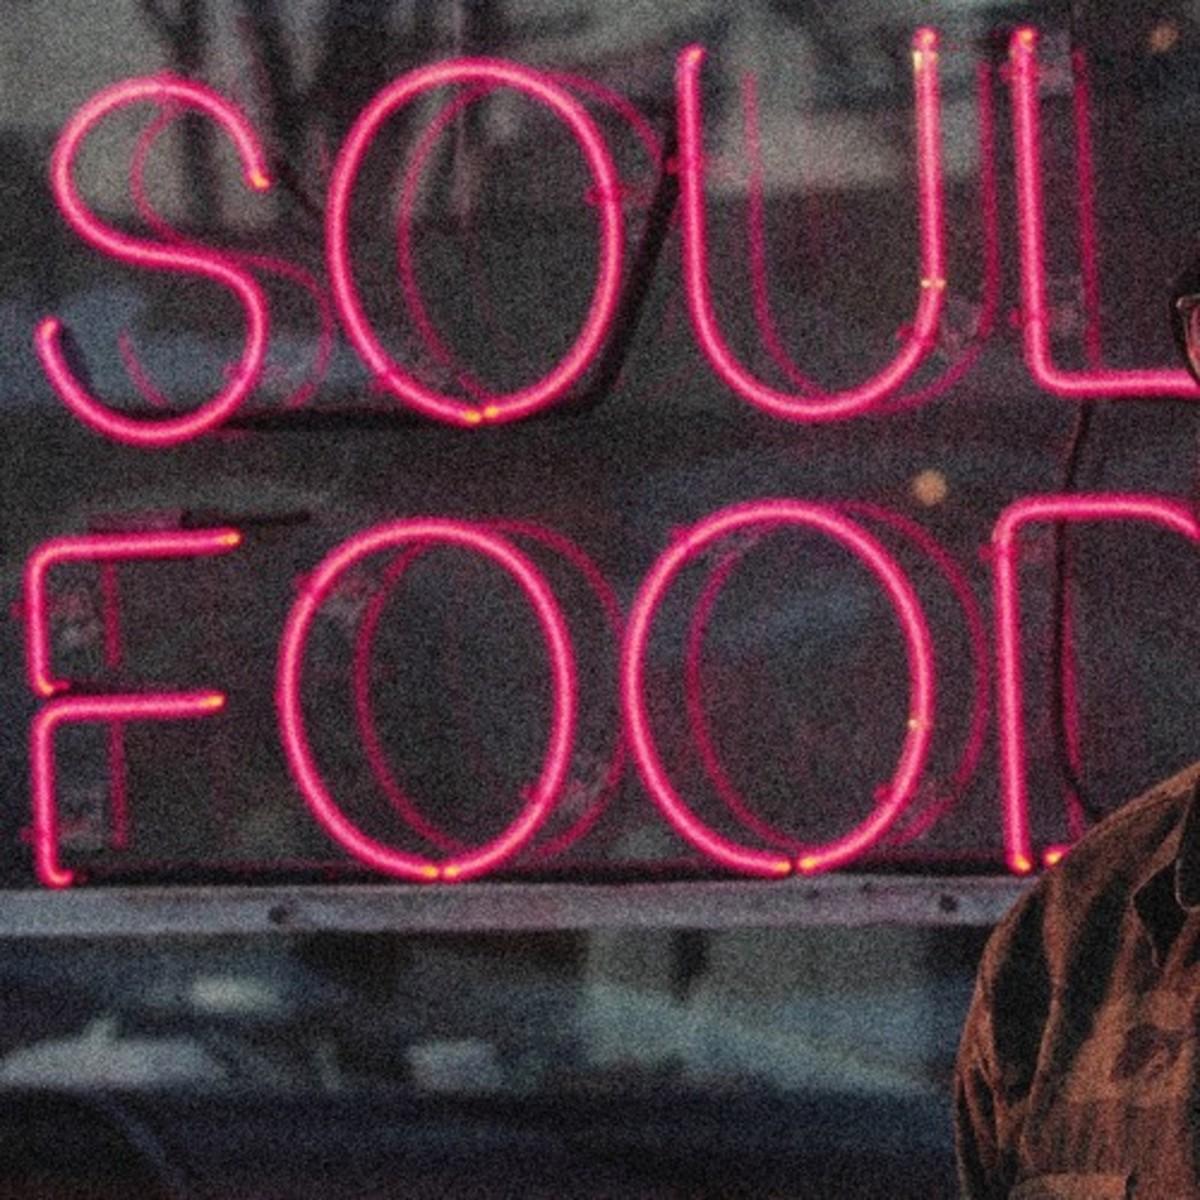 scolla-soul-food.jpg